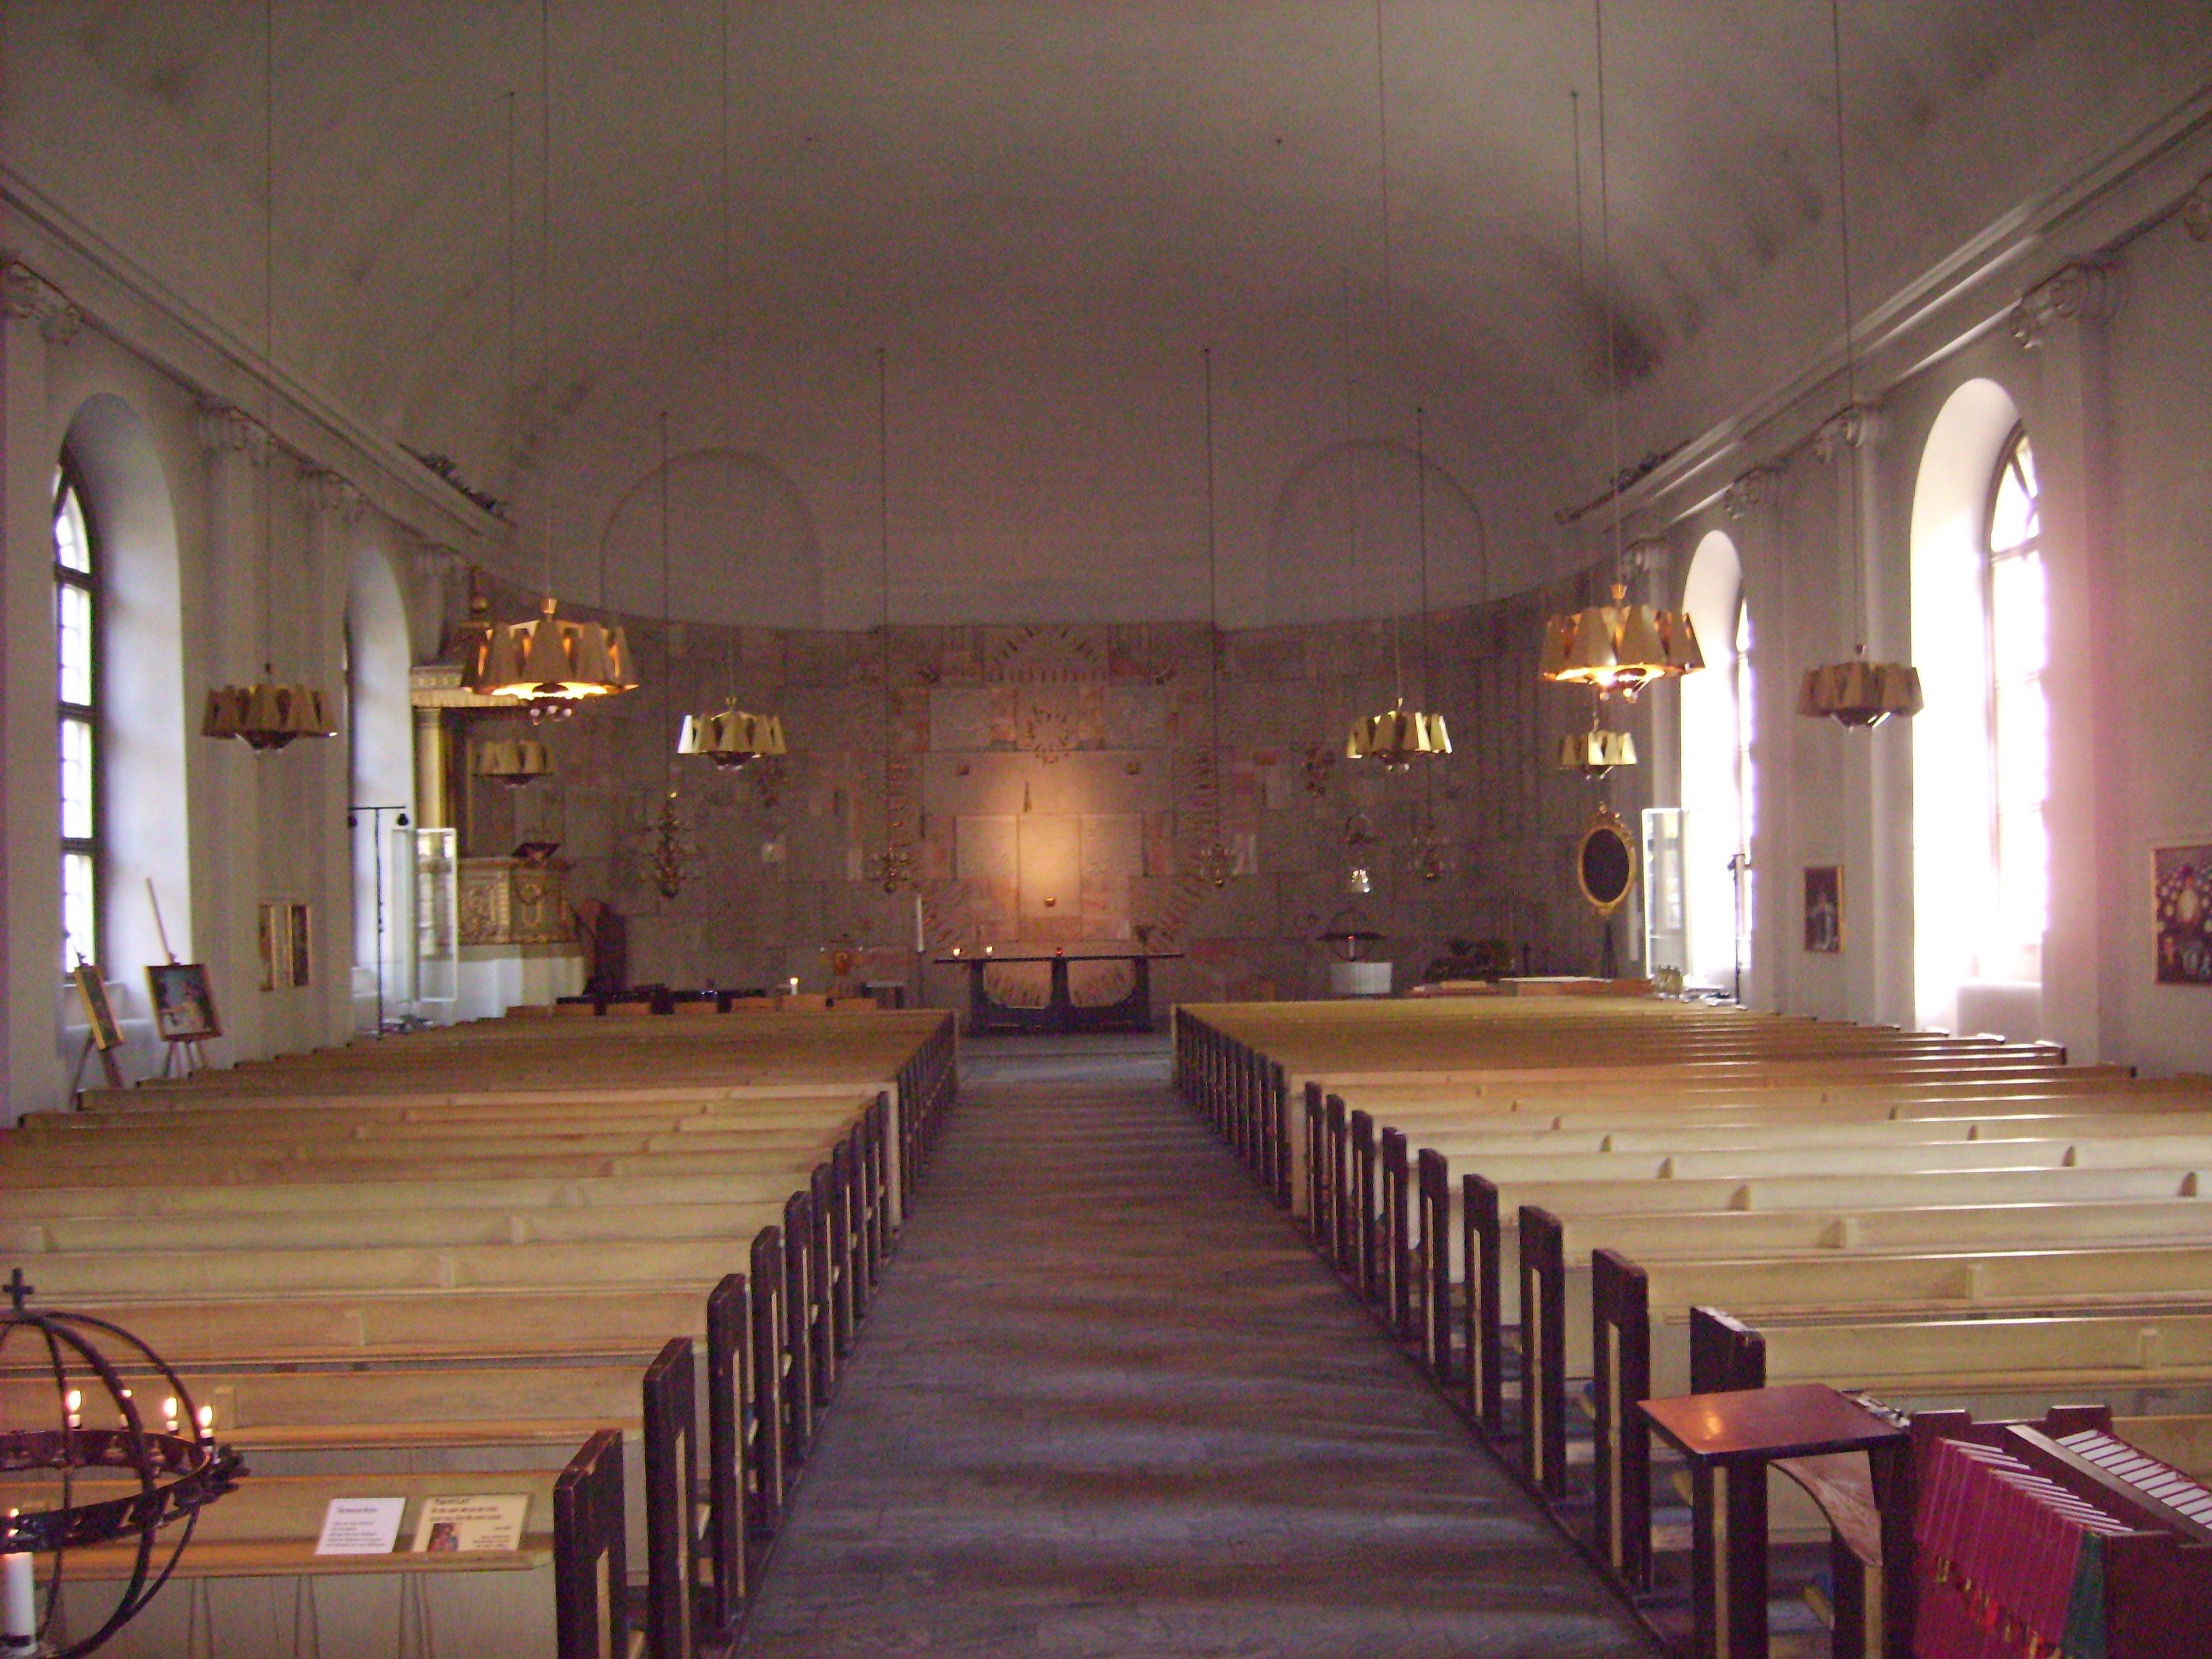 Sankt Lars kyrka, Linkping - Wikiwand